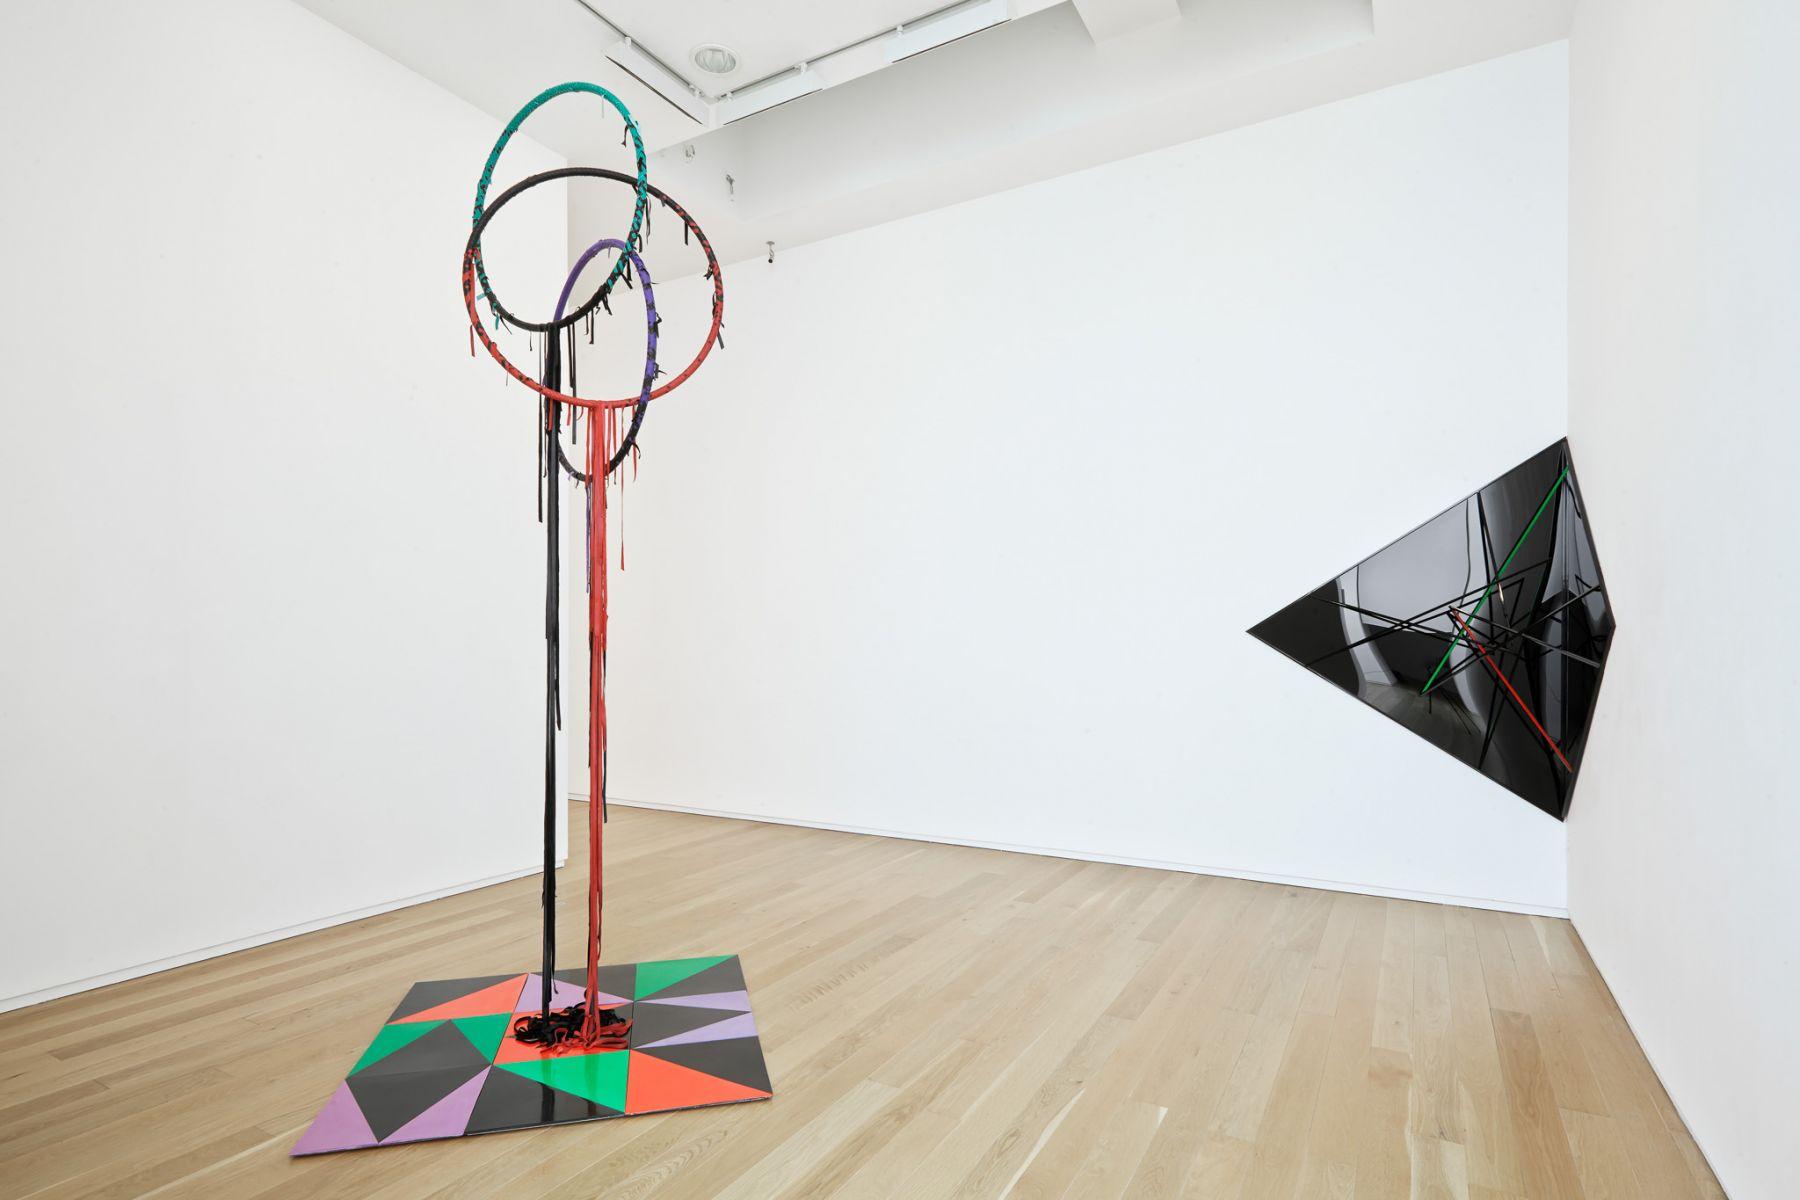 Eva Rothschild, Installation view: Dublin City Gallery, The Hugh Lane, 2014